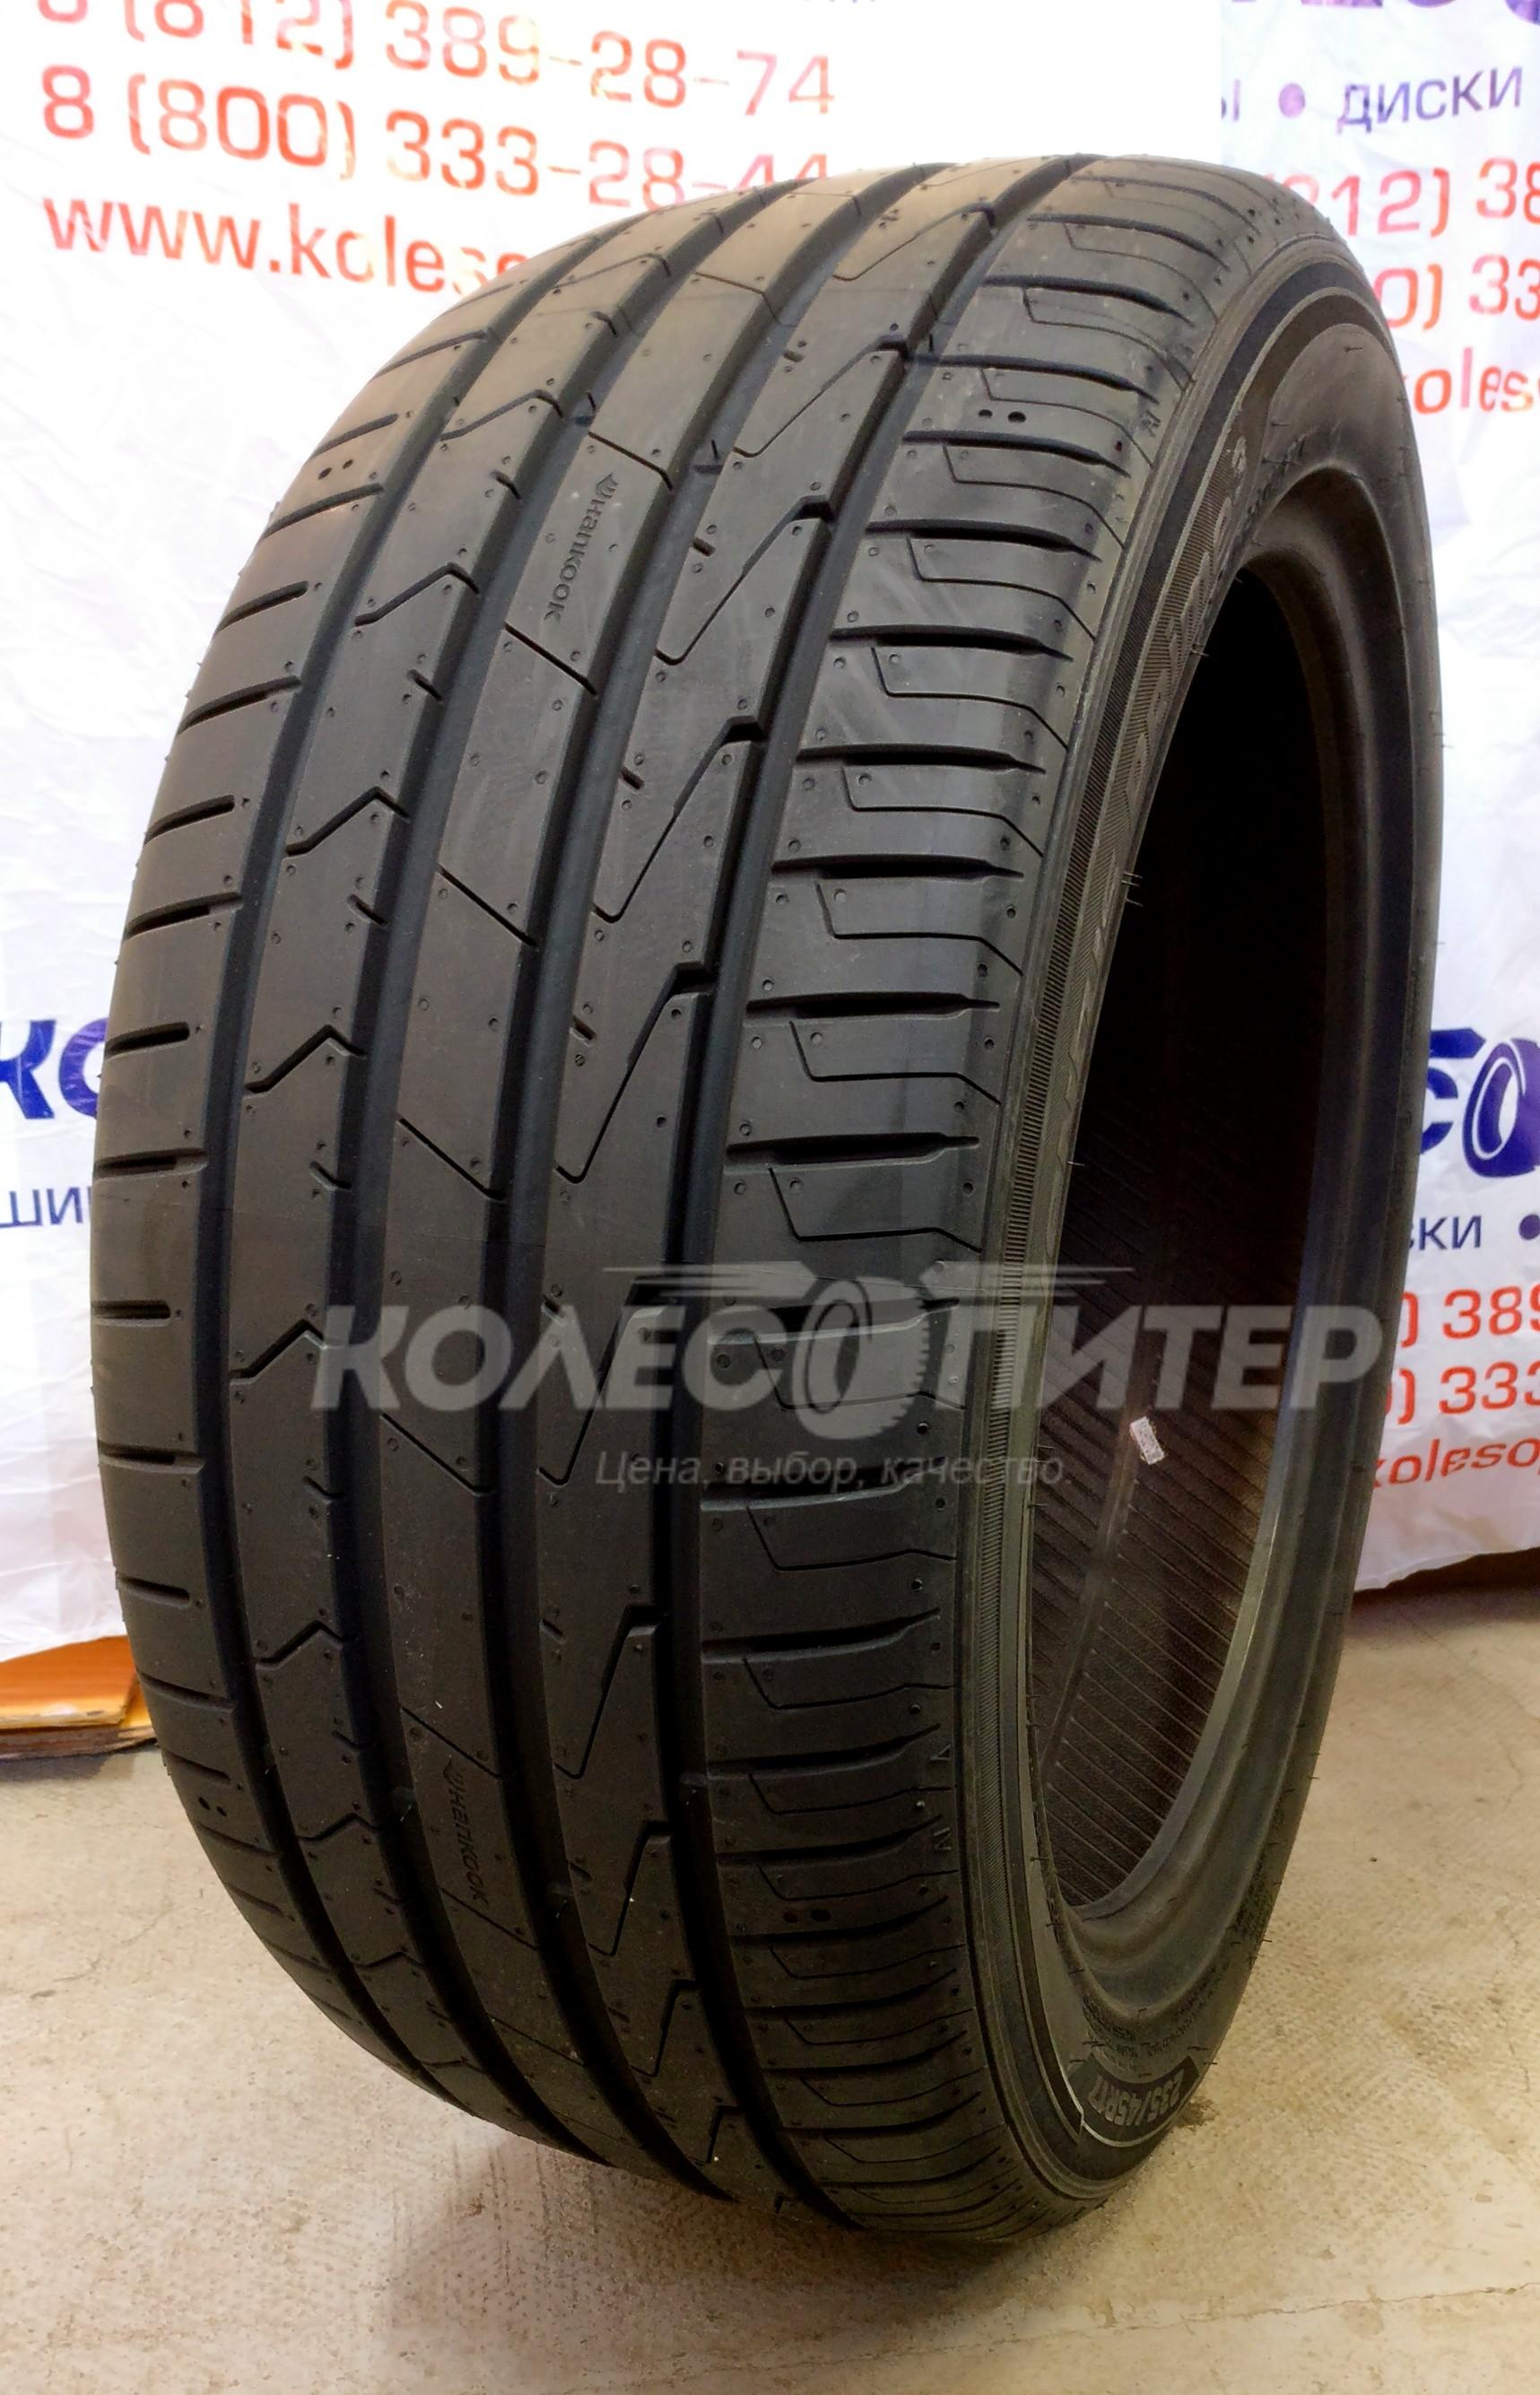 0b310f1736e Шины Hankook Tire K125 Ventus Prime 3 215/55 R17 94 V купить в ...